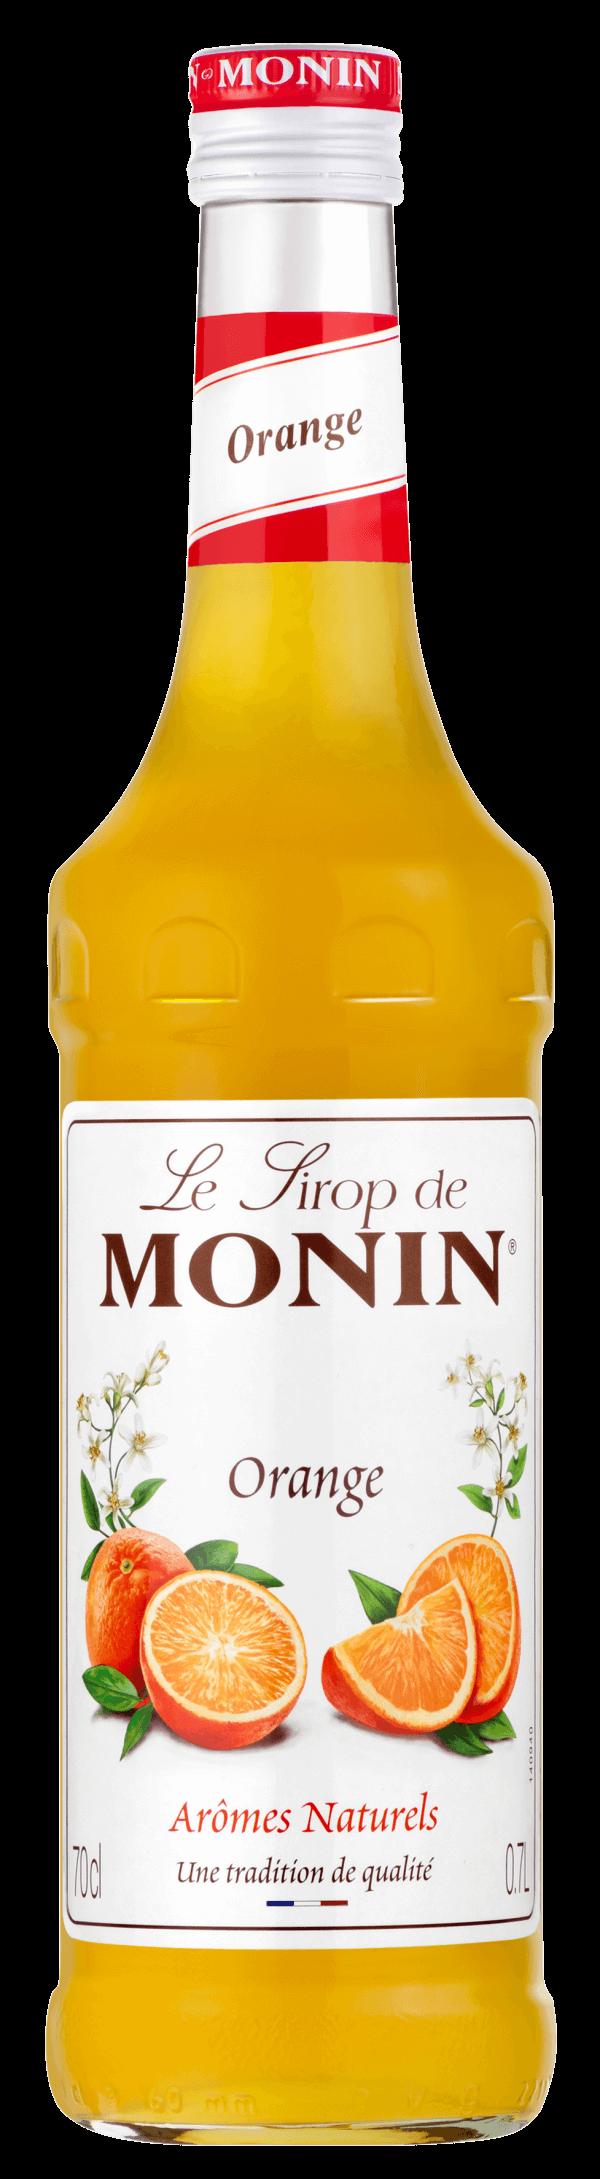 Monin_orange